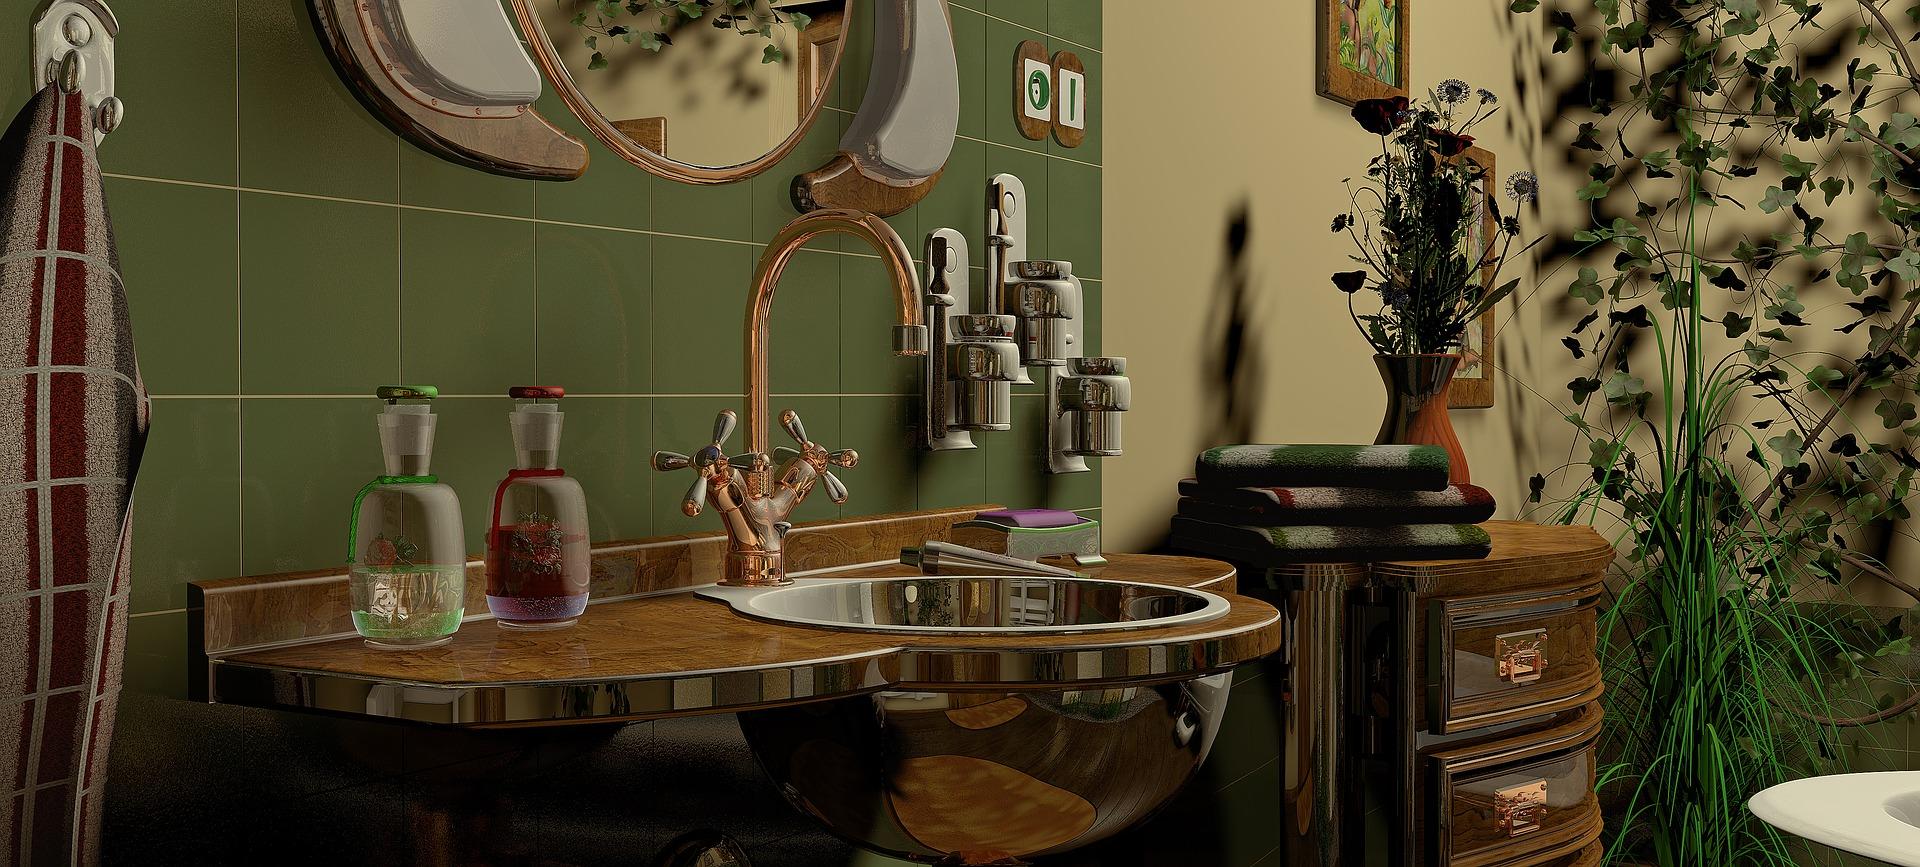 image credit  https://pixabay.com/photos/bathroom-the-interior-of-the-design-1982011/